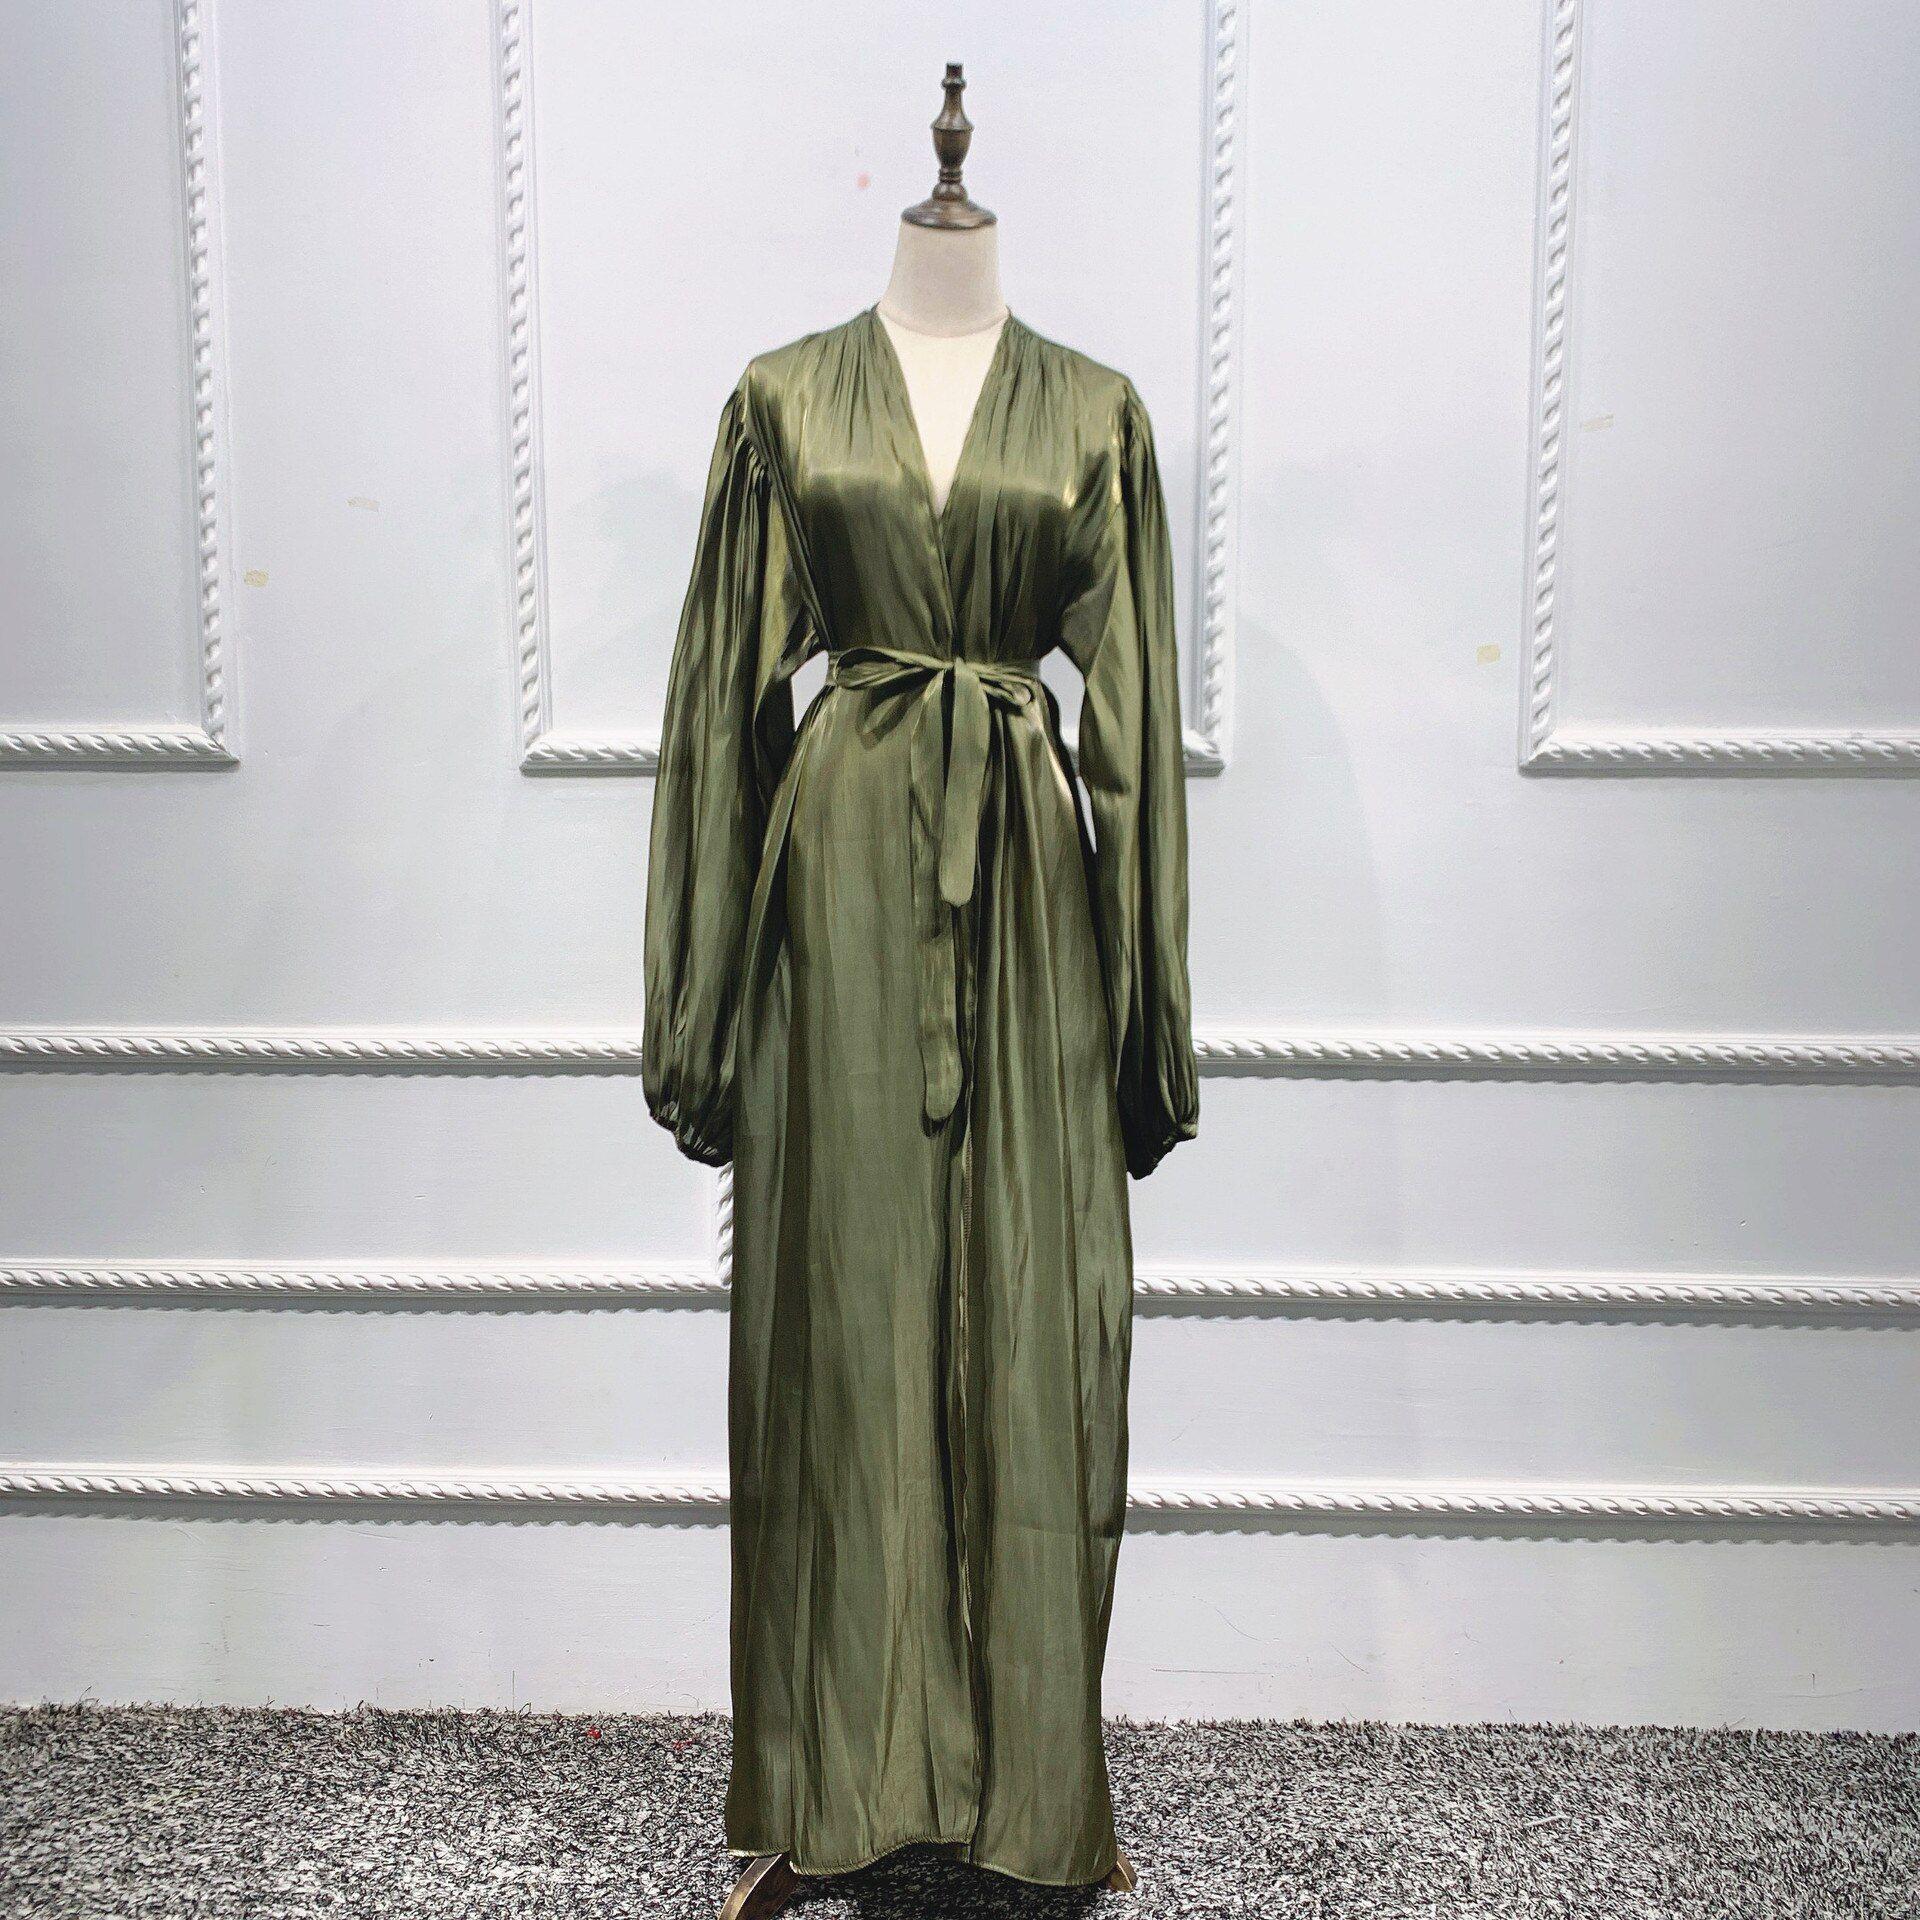 Muslim Dress Eid Abaya Bubble Sleeve Summer Dresses Abayas for Women Islamic Clothing - green / XL / United States